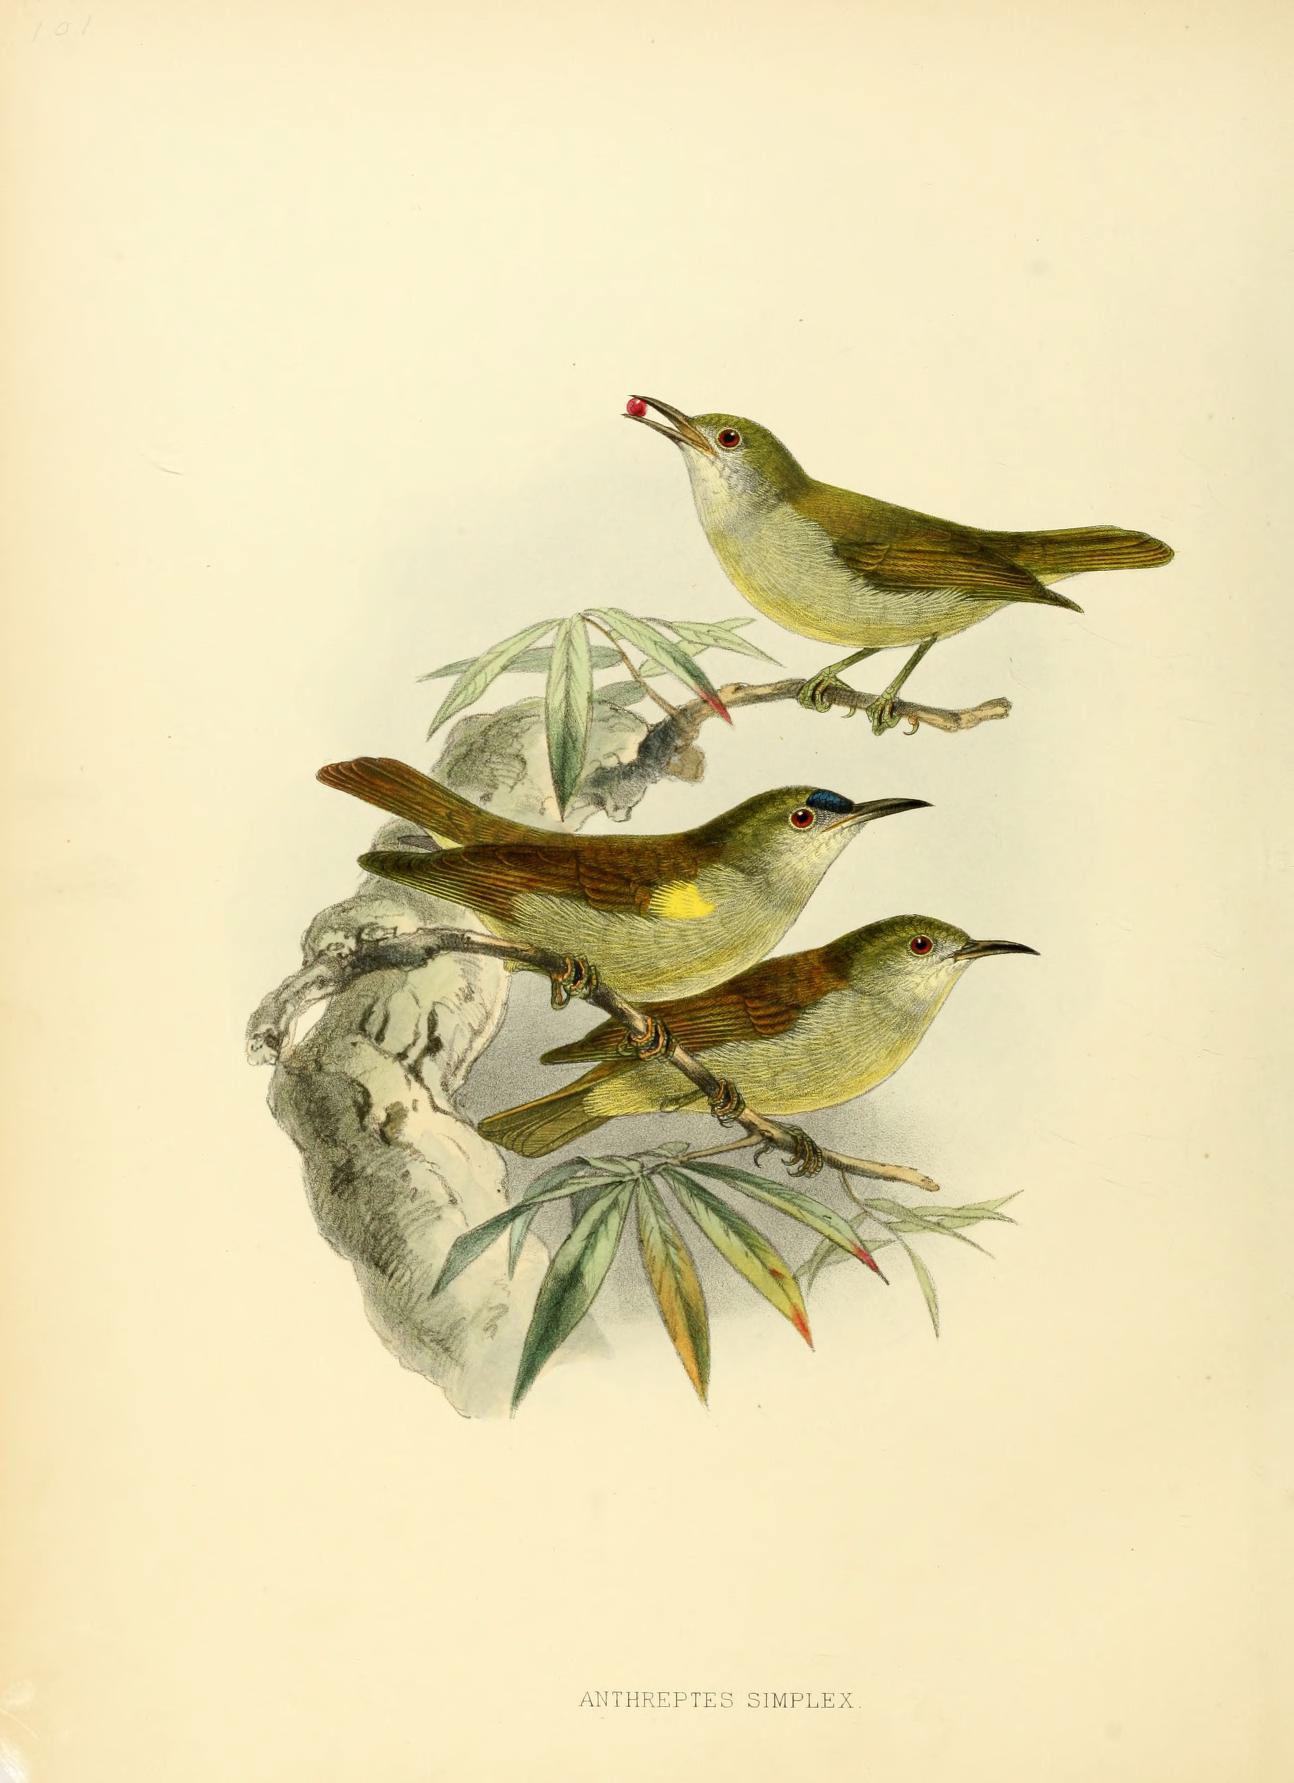 Image of Plain Sunbird